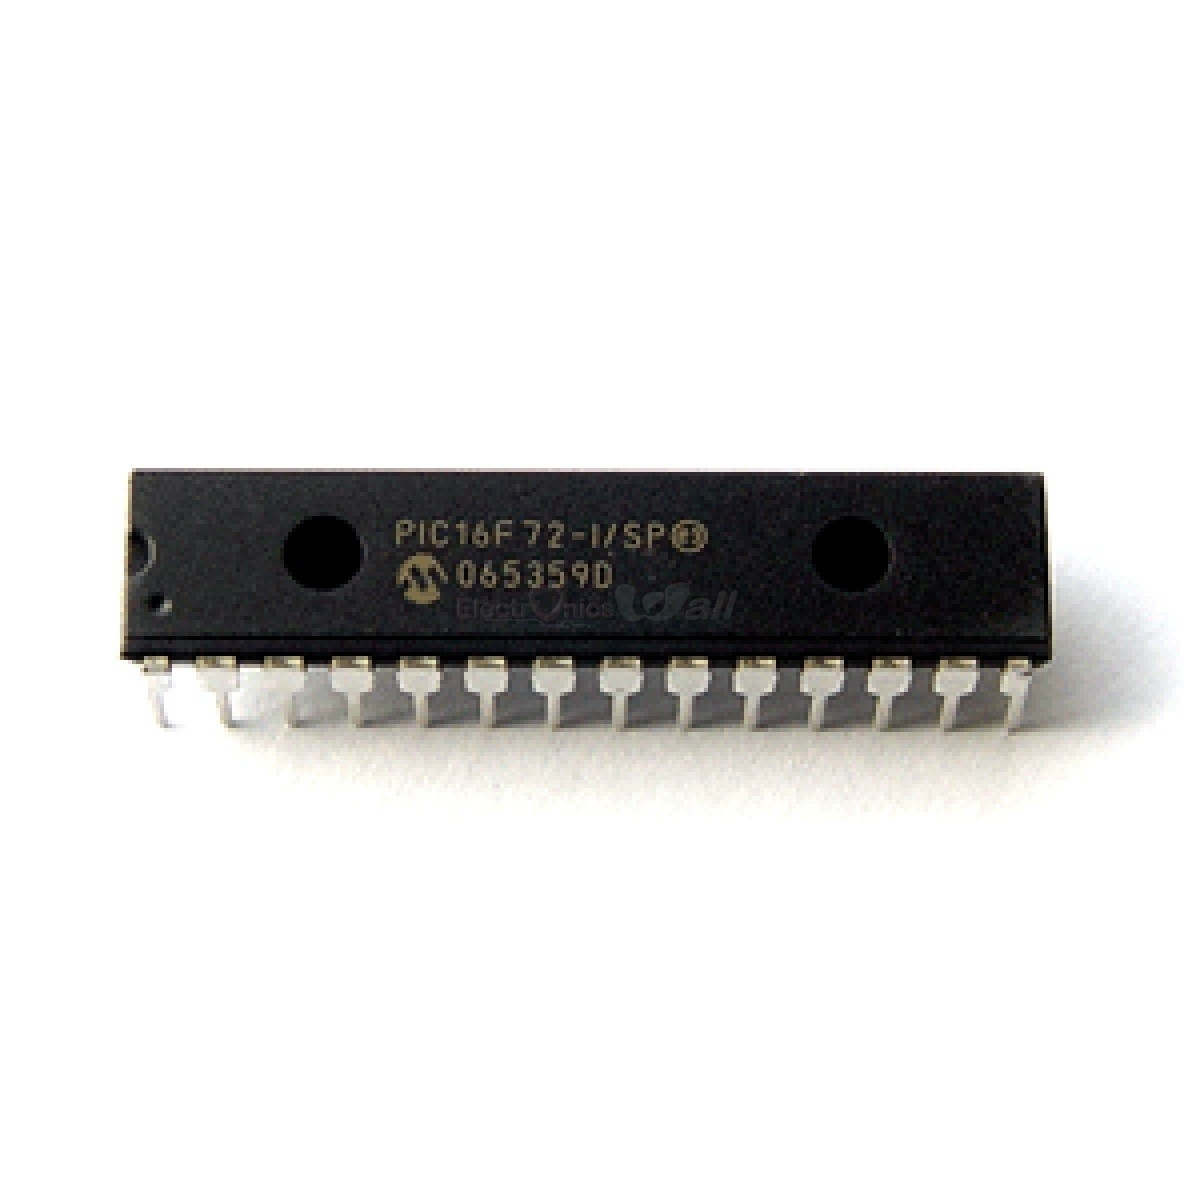 PIC 16F72-I/SP MICROCONTROLLER